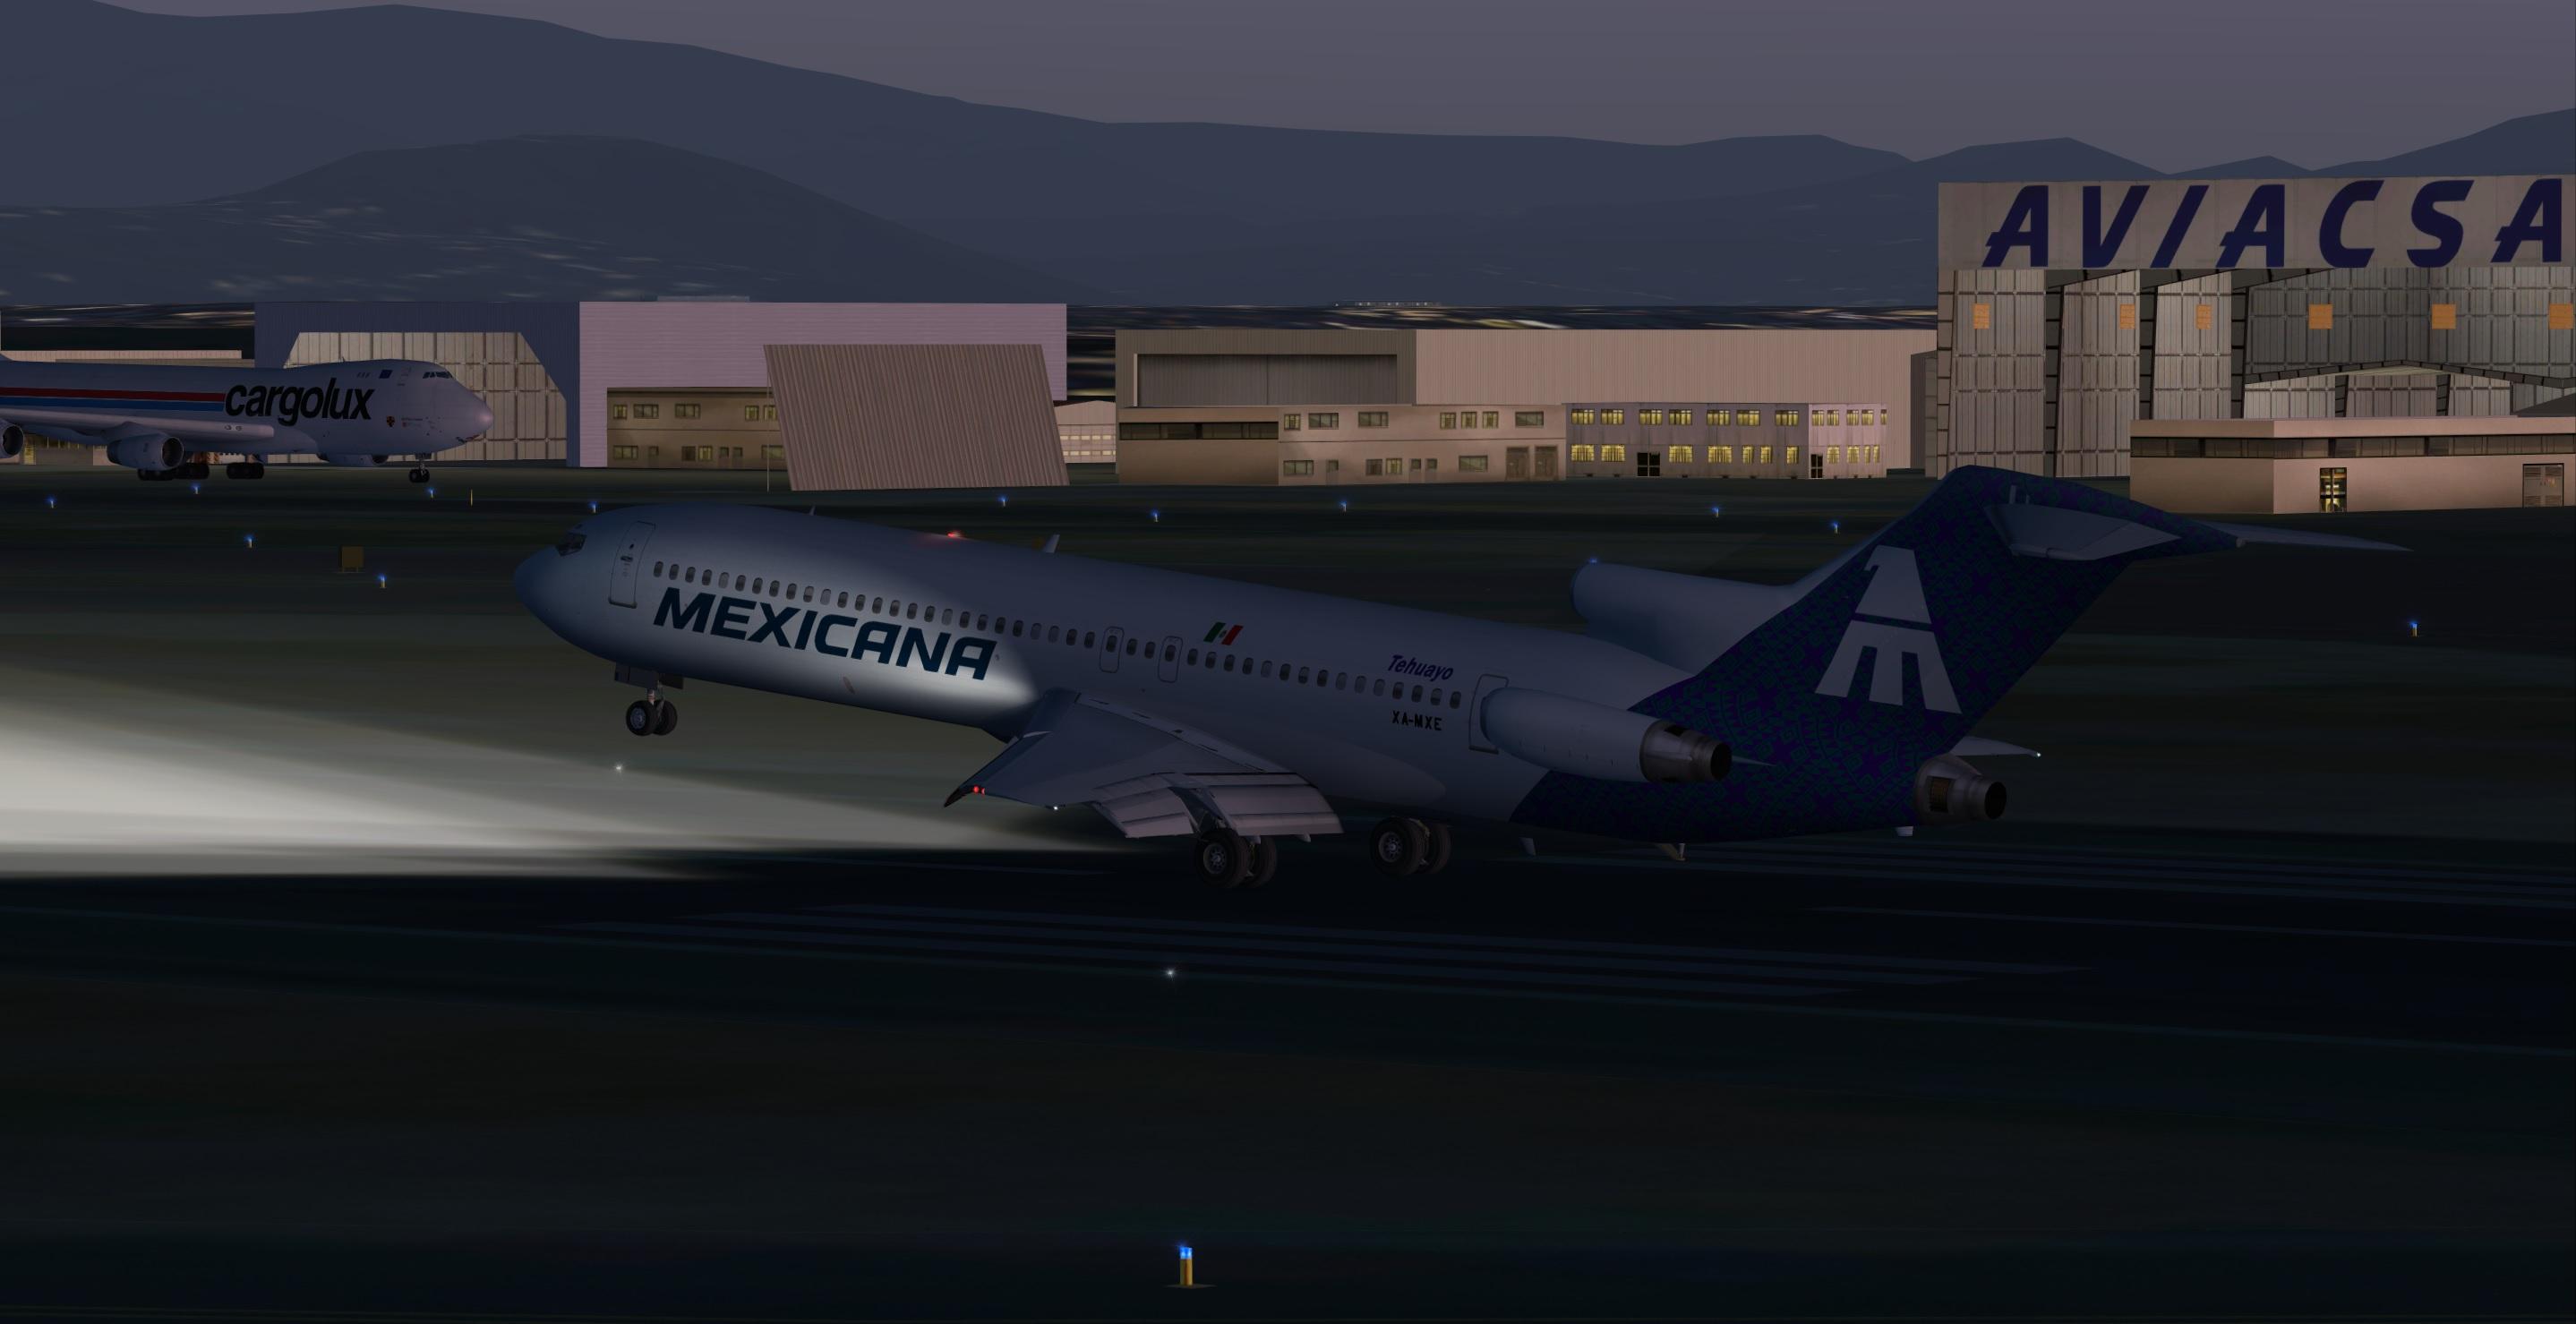 mexicana_boeing_727-2mjklh.jpg